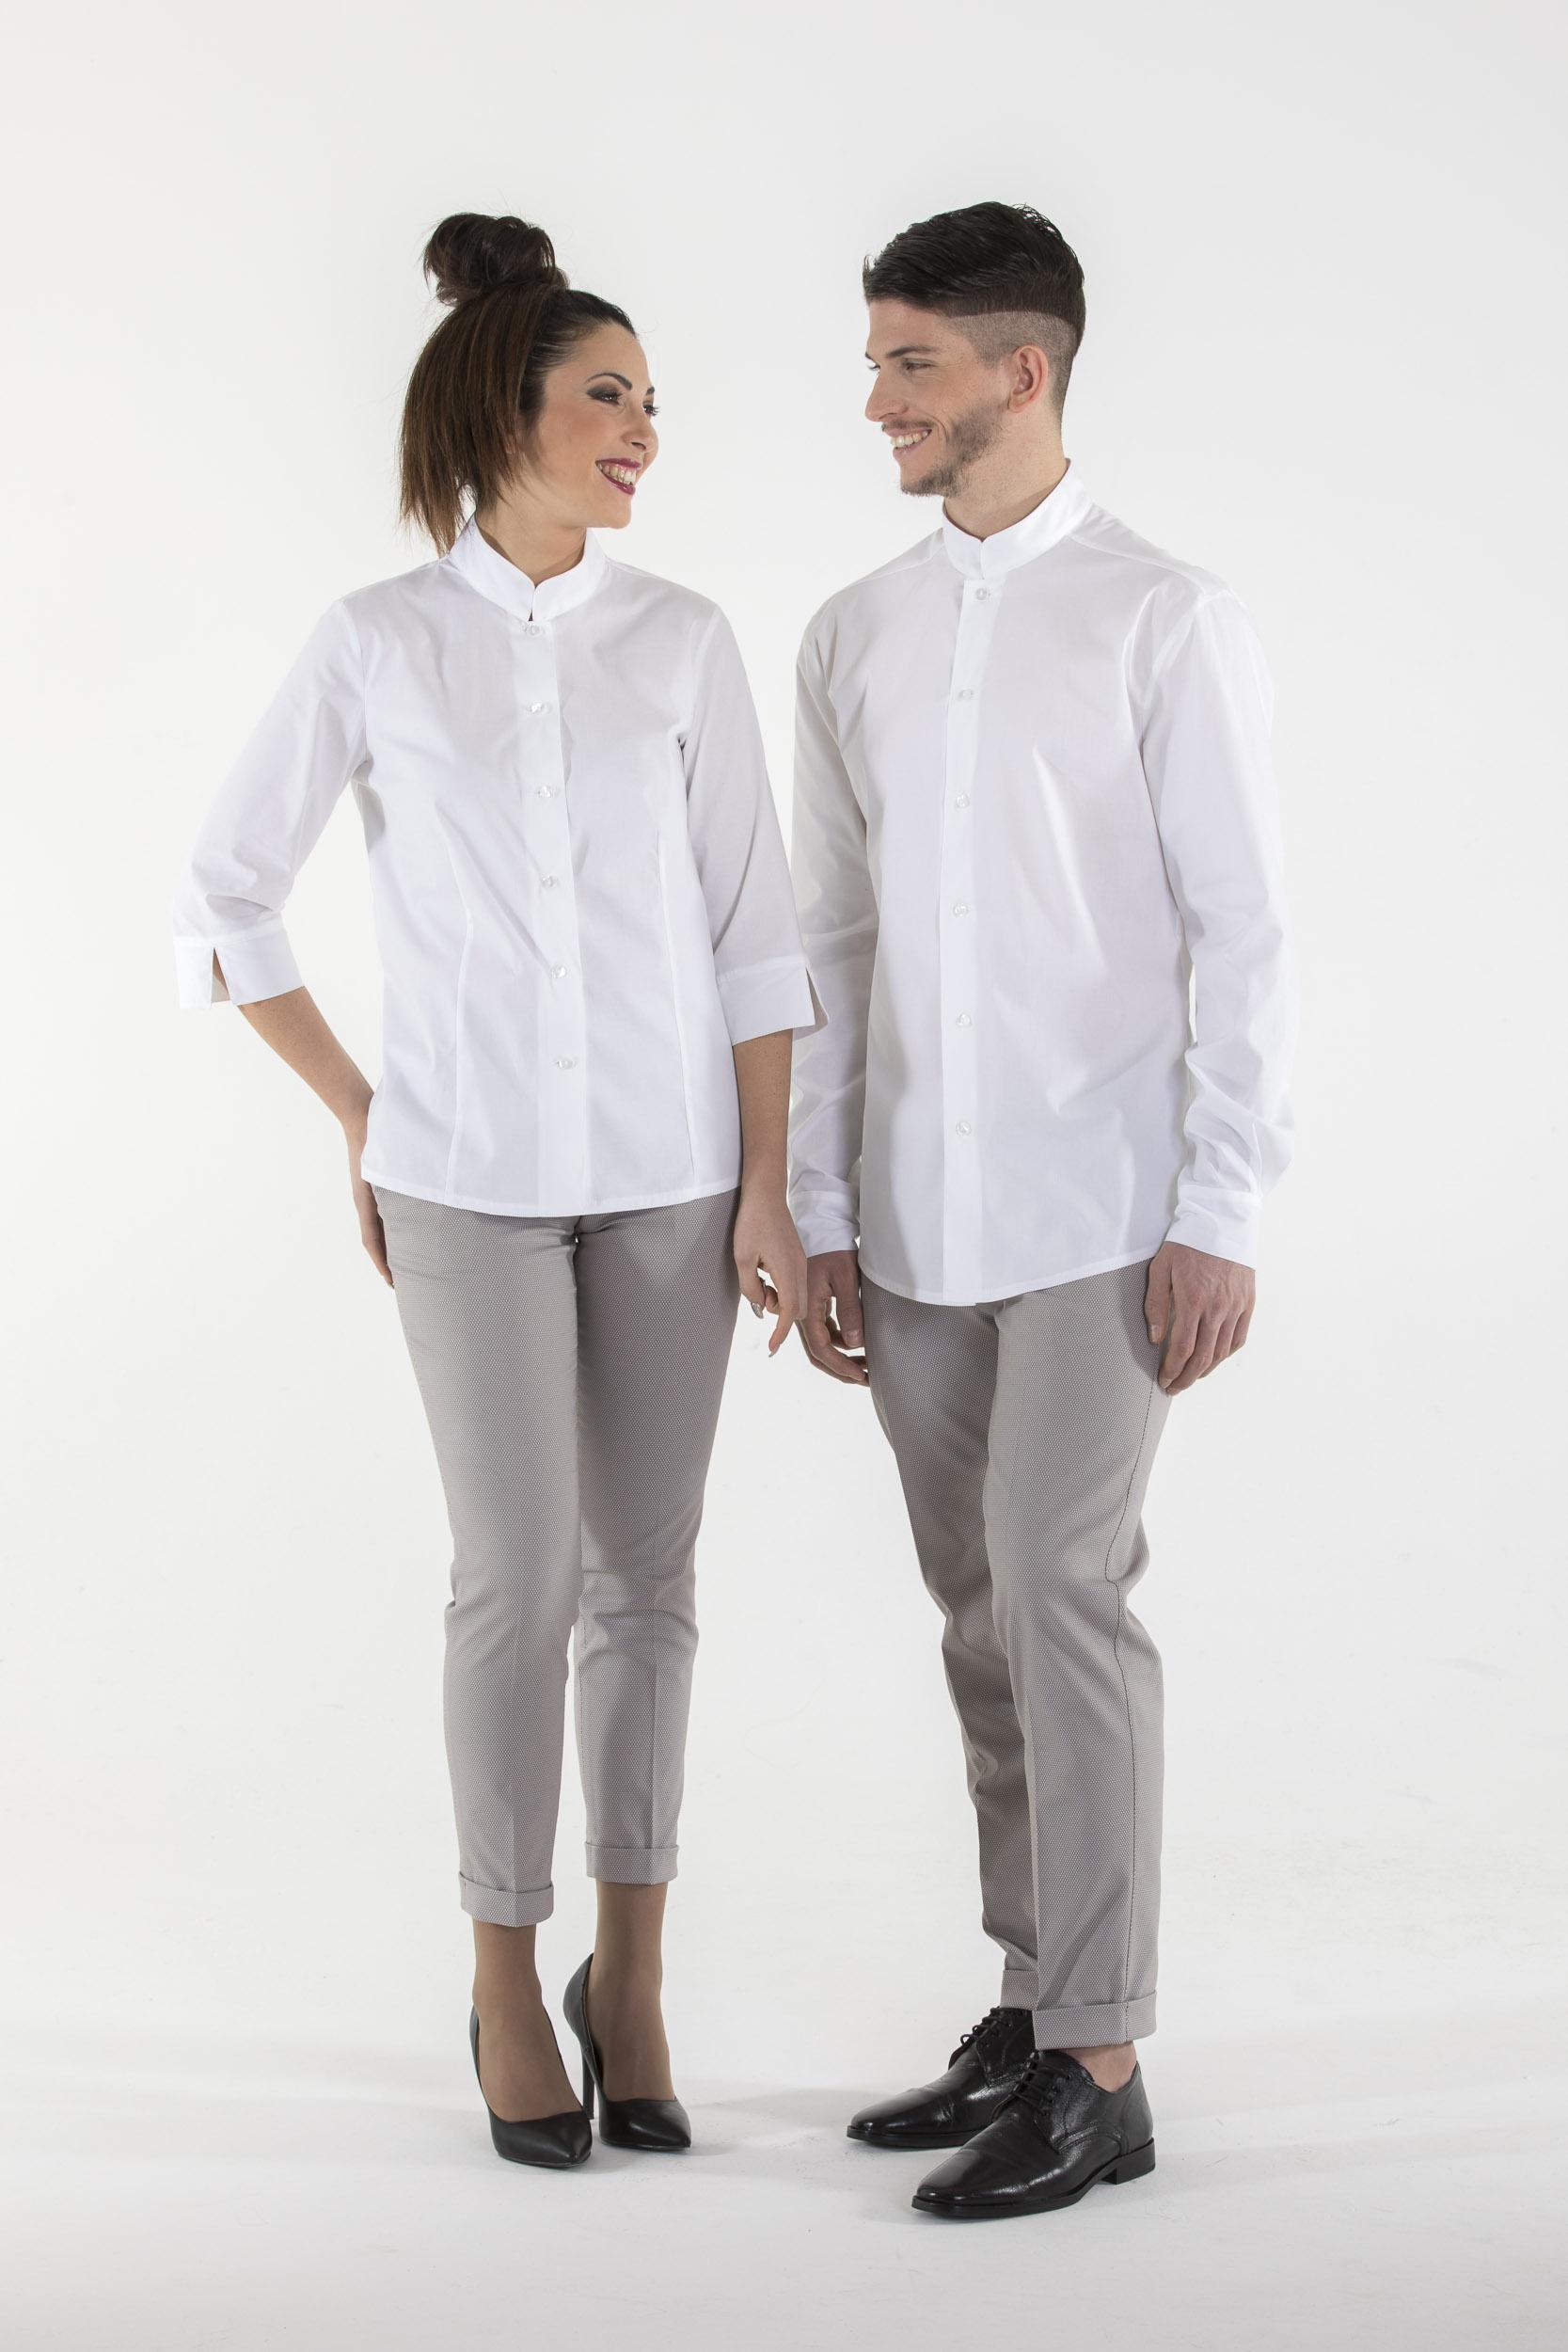 Divise classiche per ristoranti - Creativity clothingsxwork